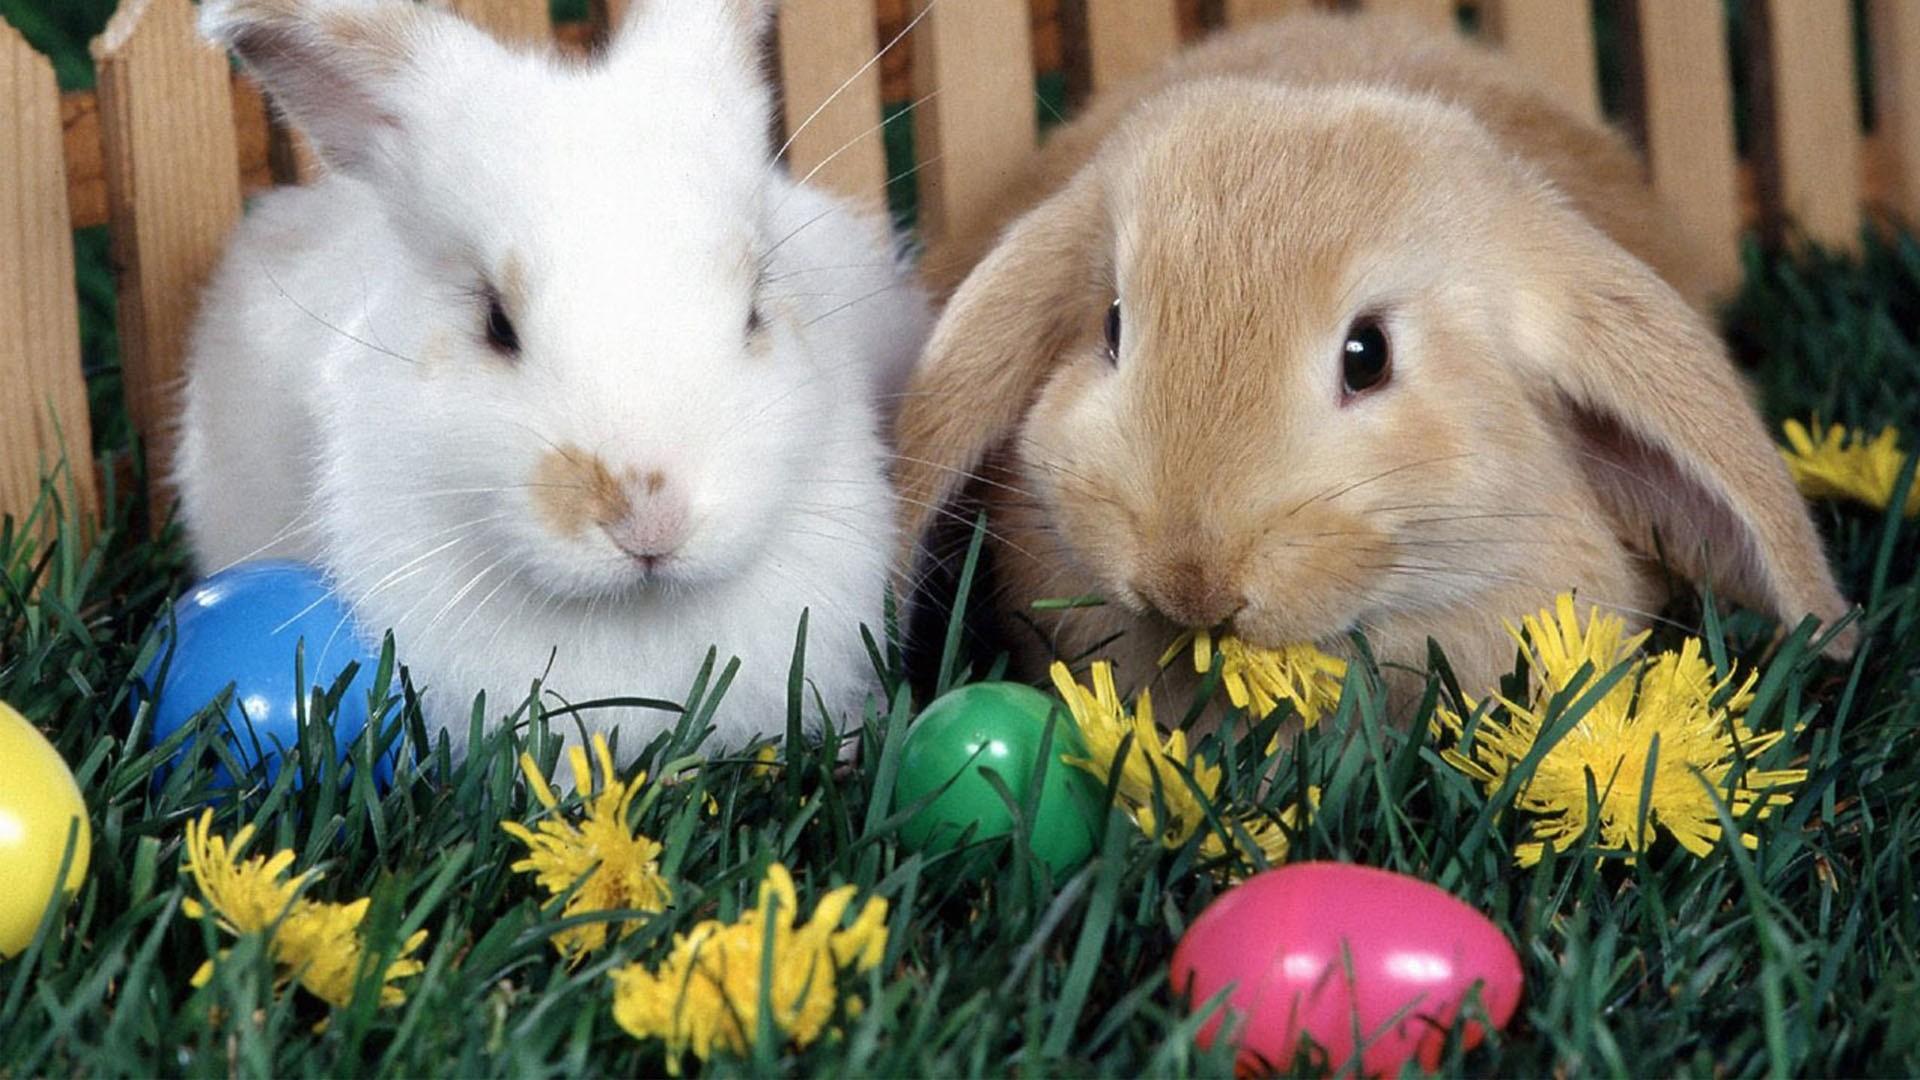 72 Easter Bunny Desktop Wallpaper On Wallpapersafari